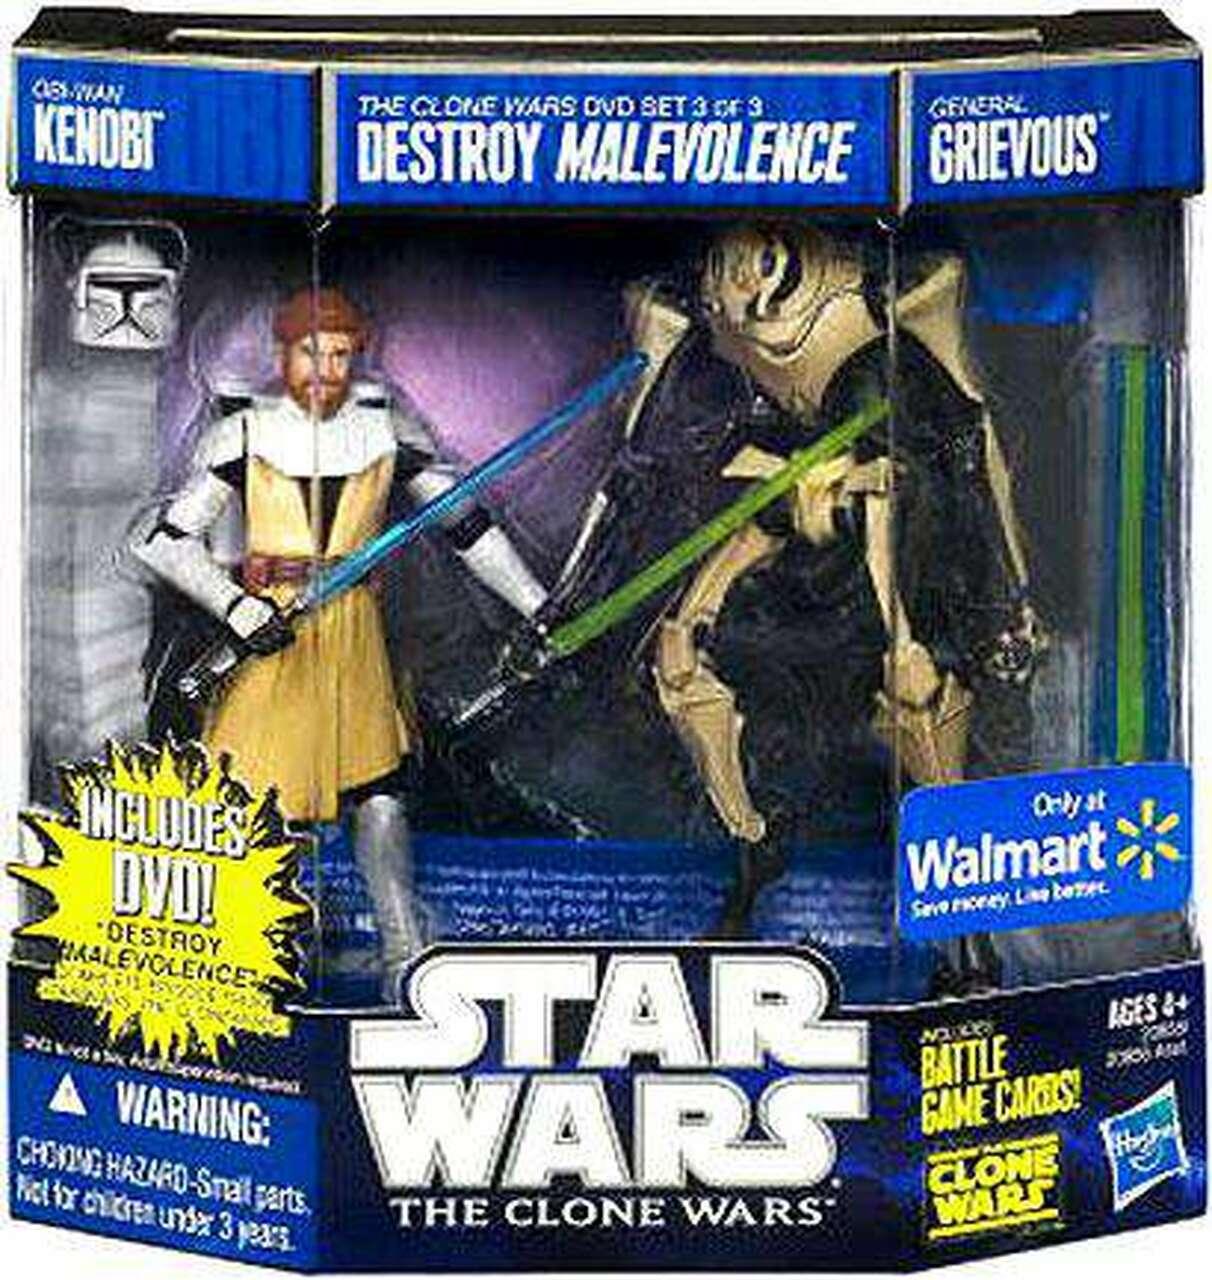 Star Wars The Clone Wars: Destroy Malevolence DVD